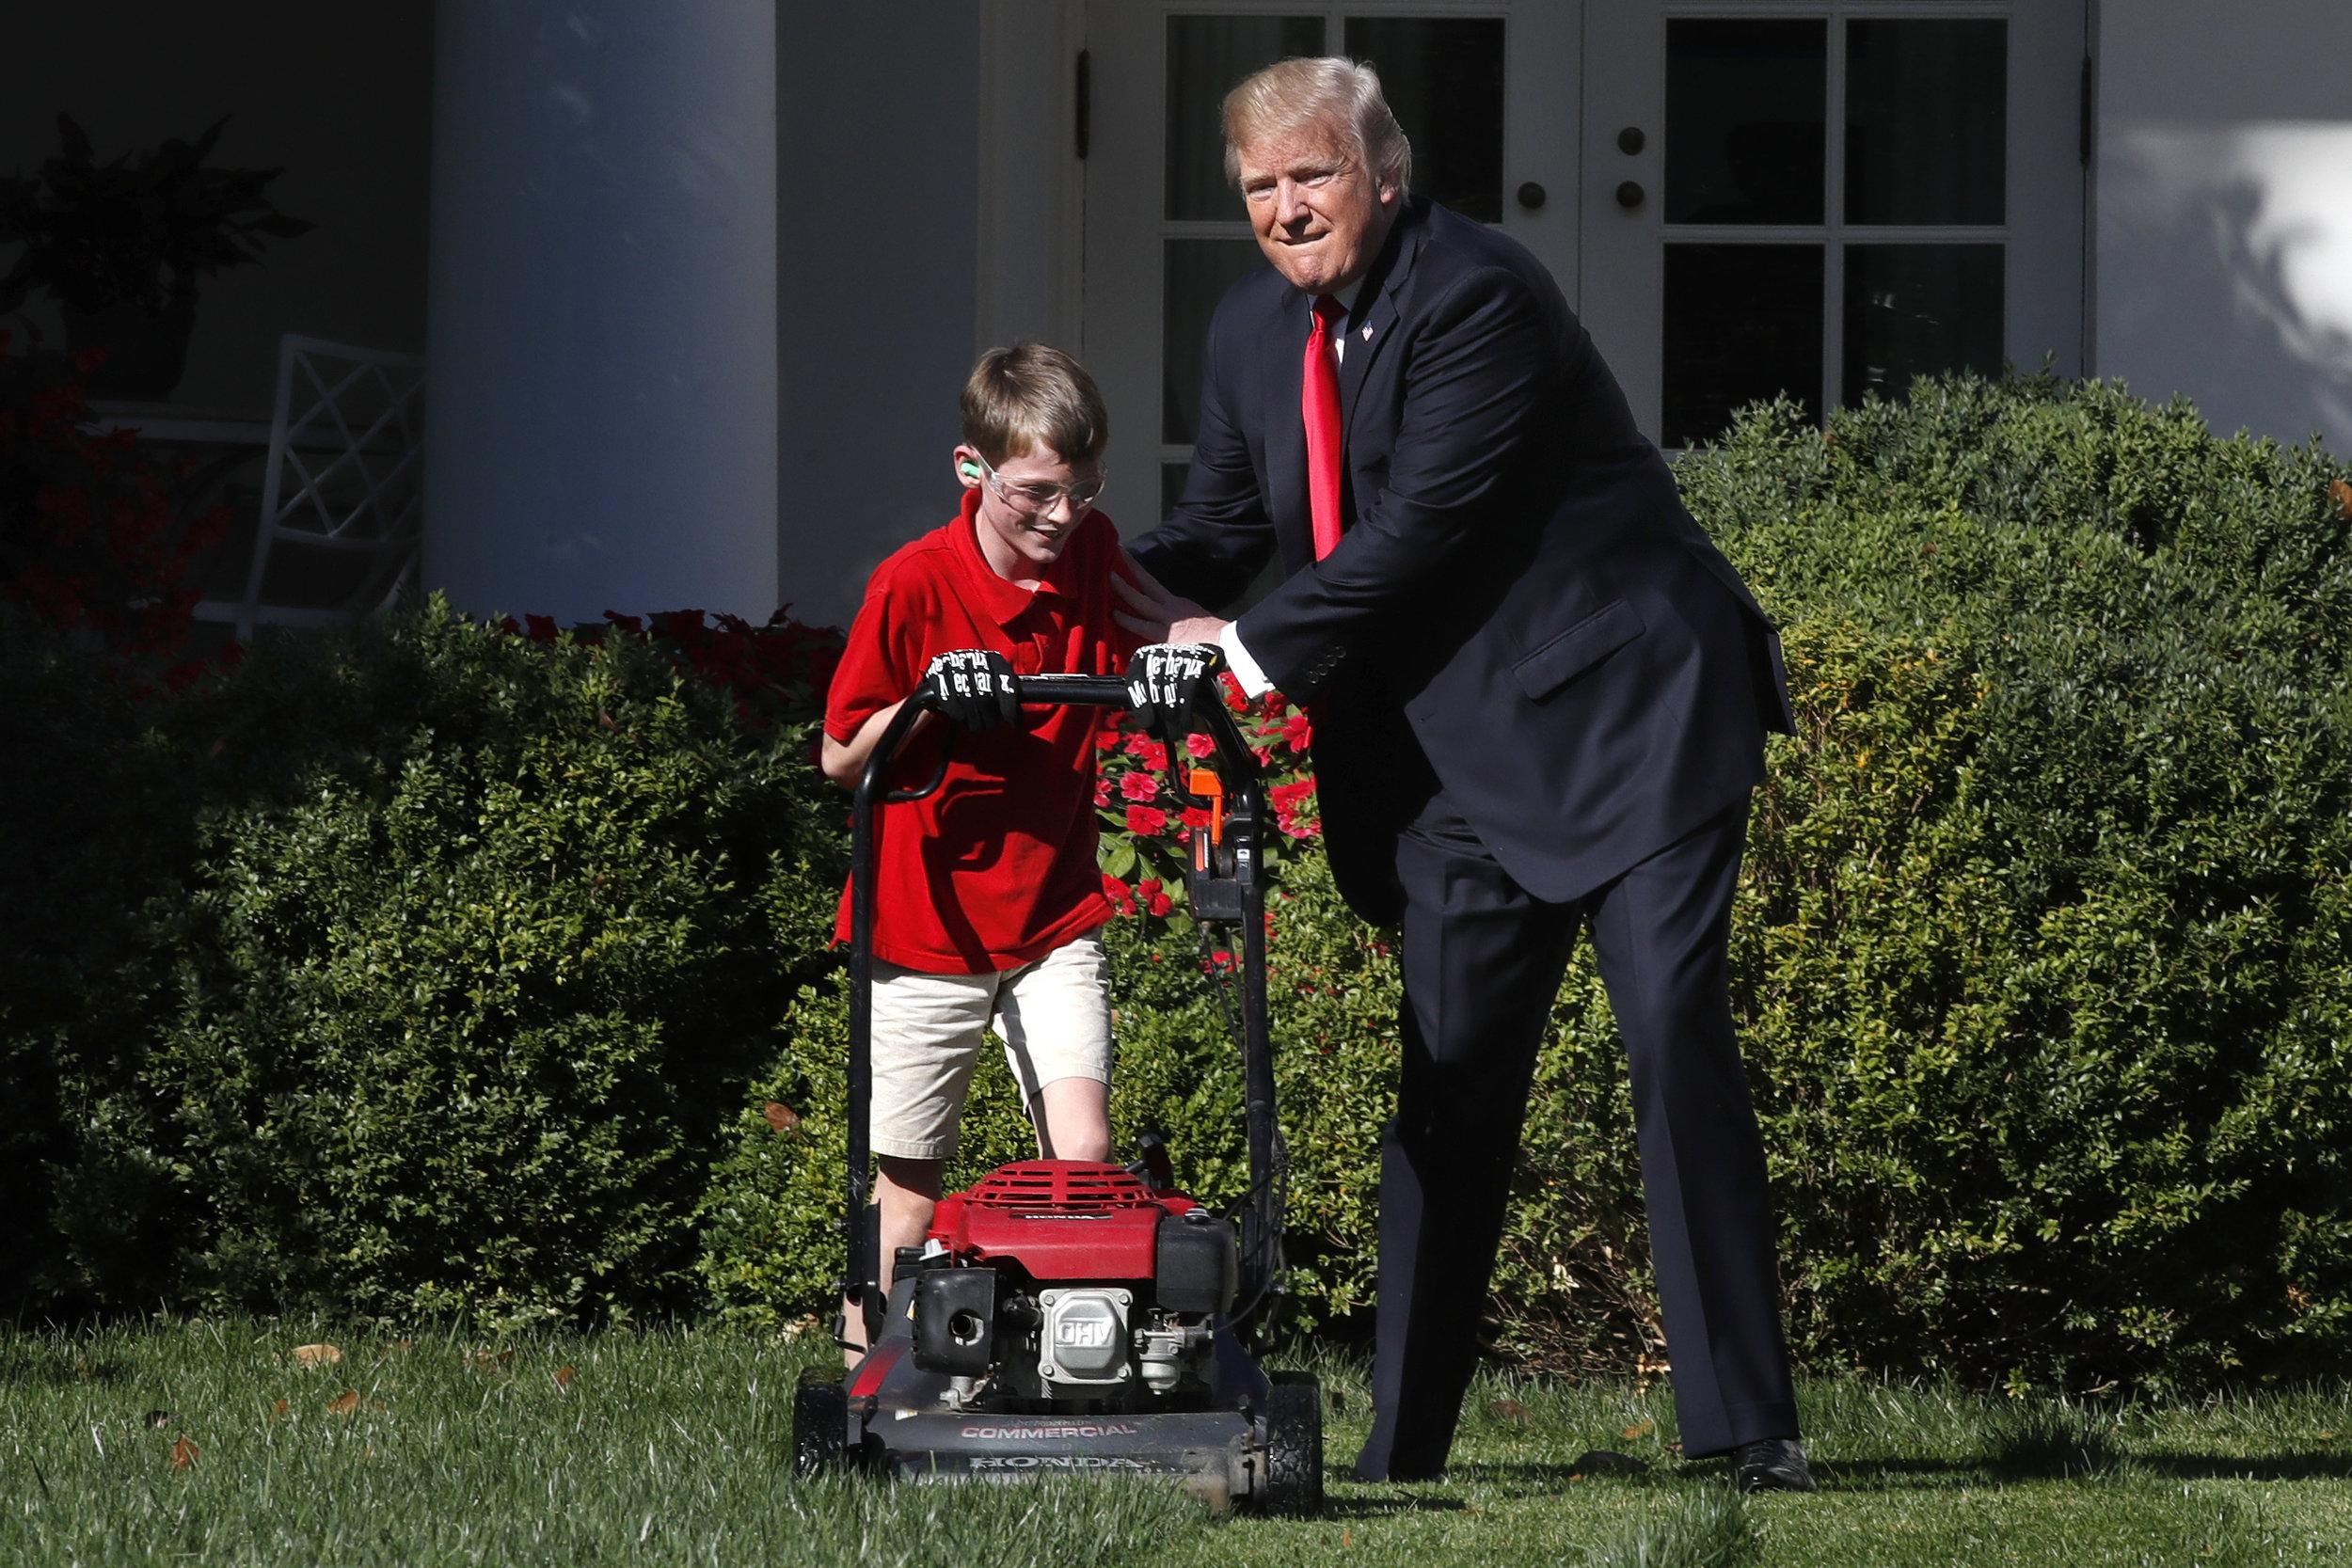 Trump Lawn Mowing Boy